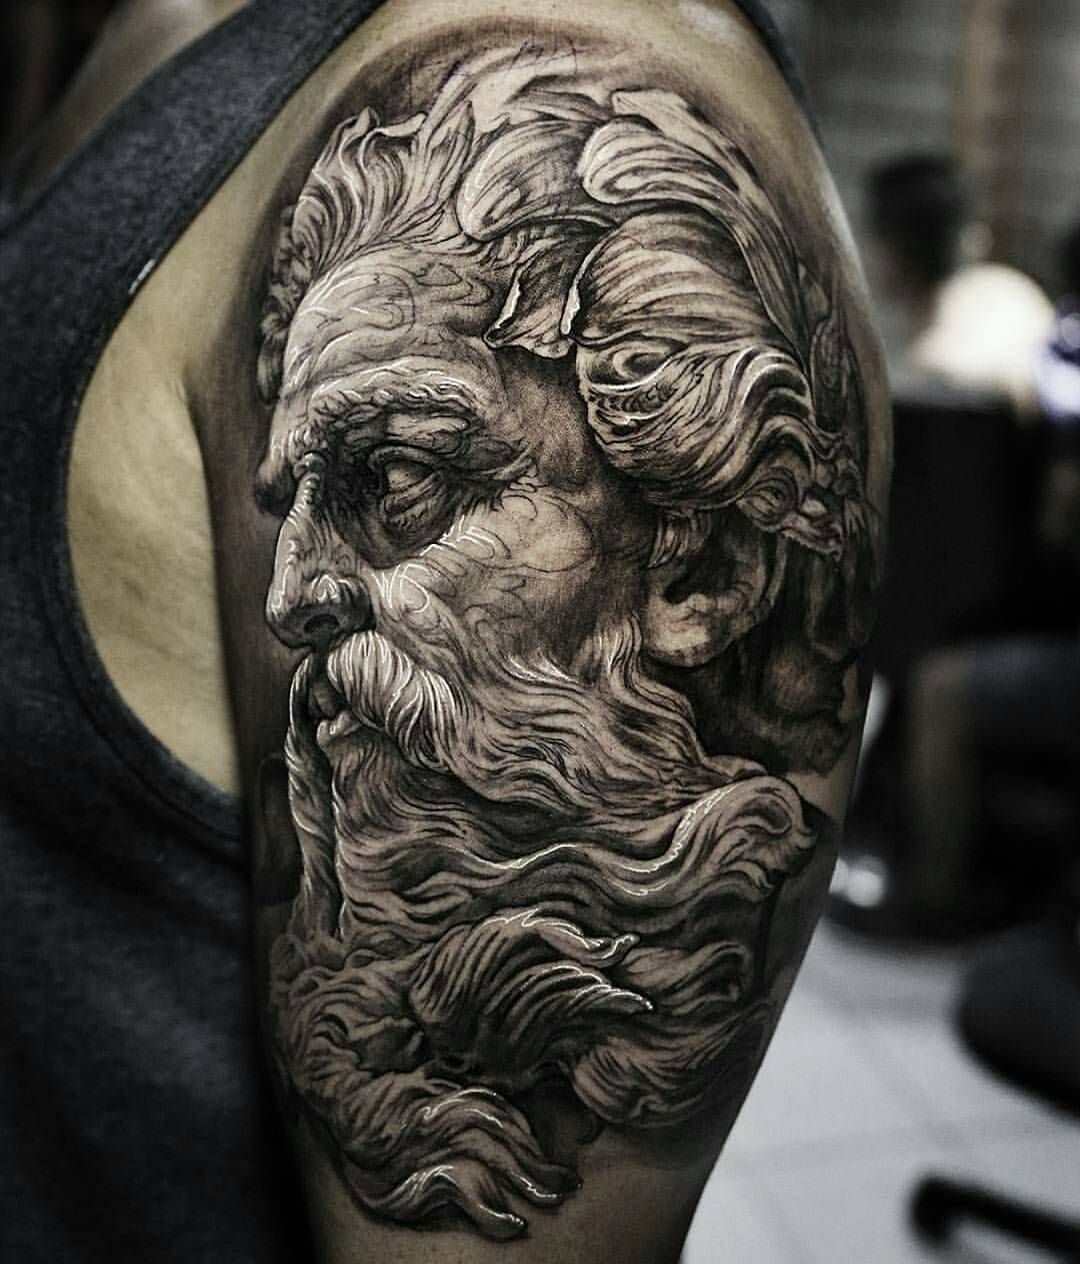 Tattoorealistic On Picoji Posts Videos Stories Picoji Tattoos Tattoodesigns Tattooideas Fantastic Piece Mythology Tattoos Zeus Tattoo Tattoos For Guys